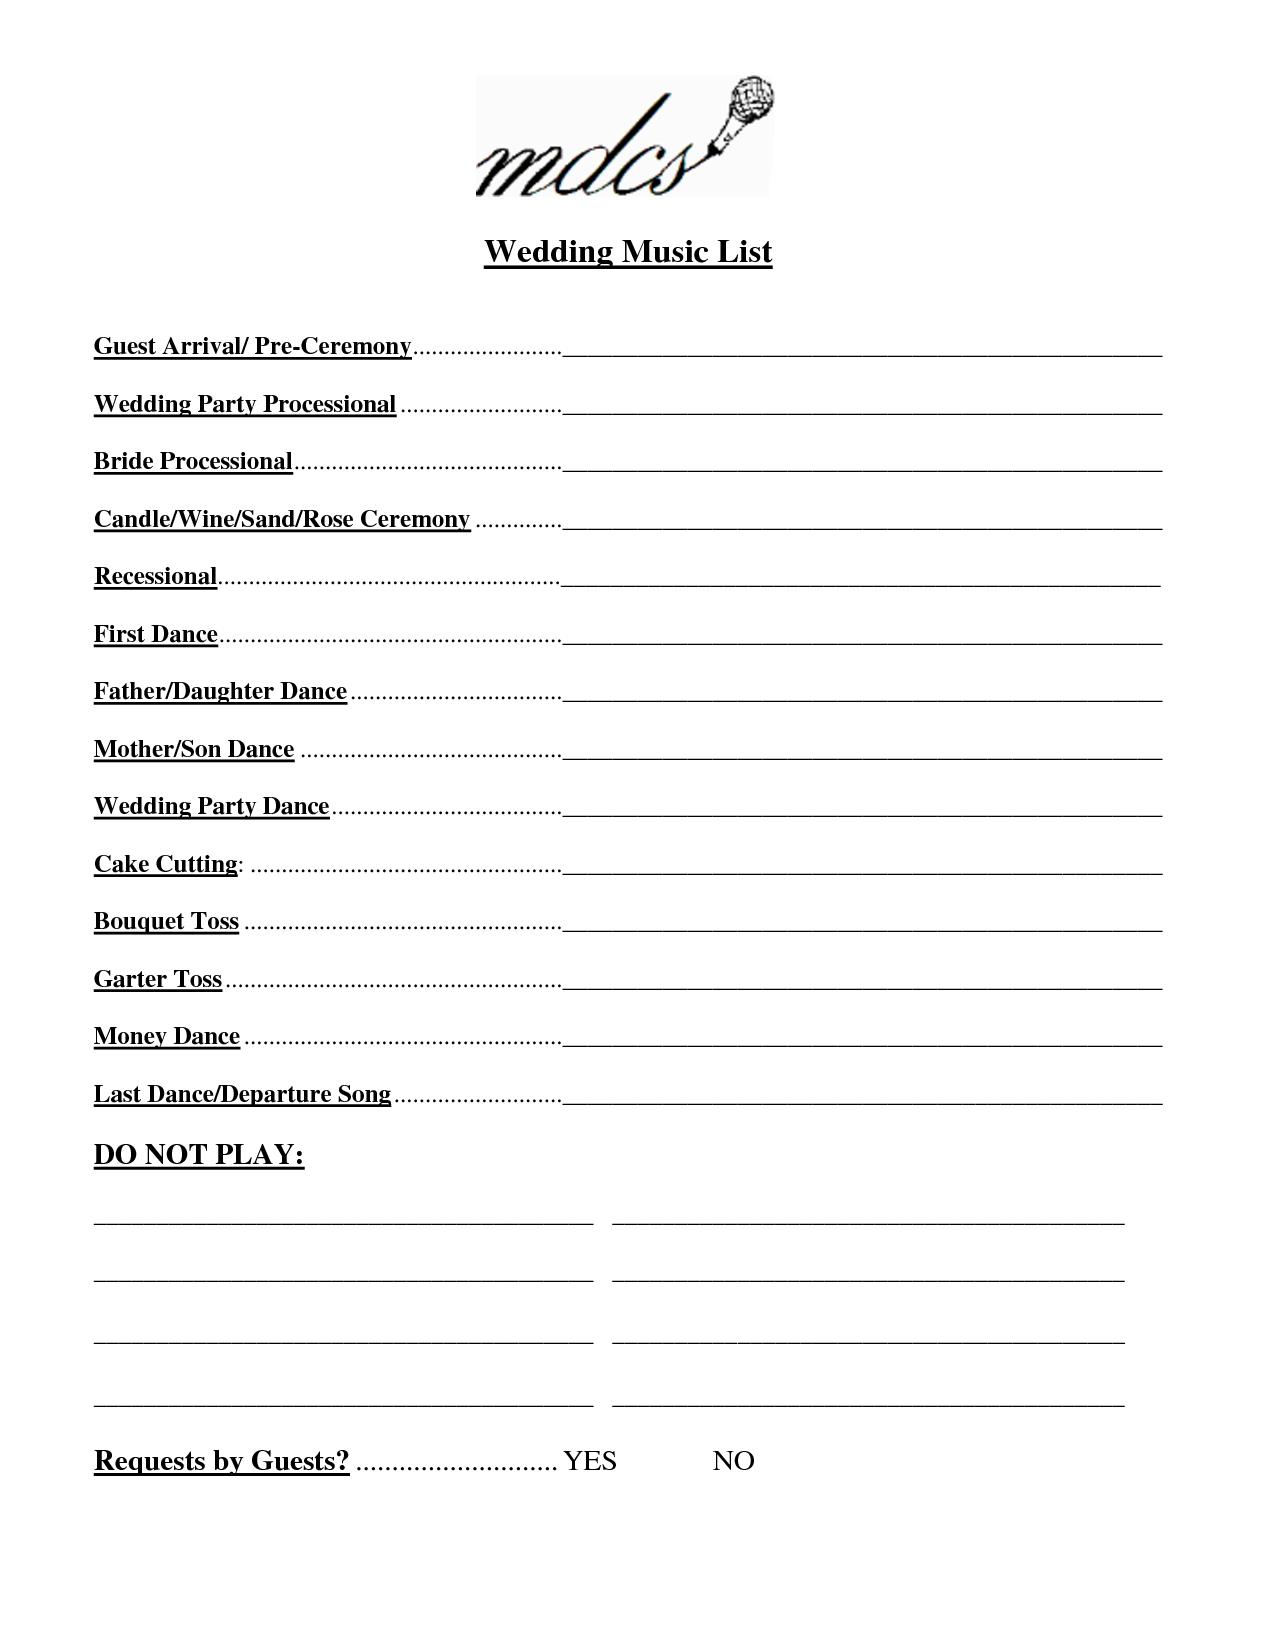 Wedding Party List Template Free   Fosterhaley Wedding Music List - Free Printable Wedding Party List